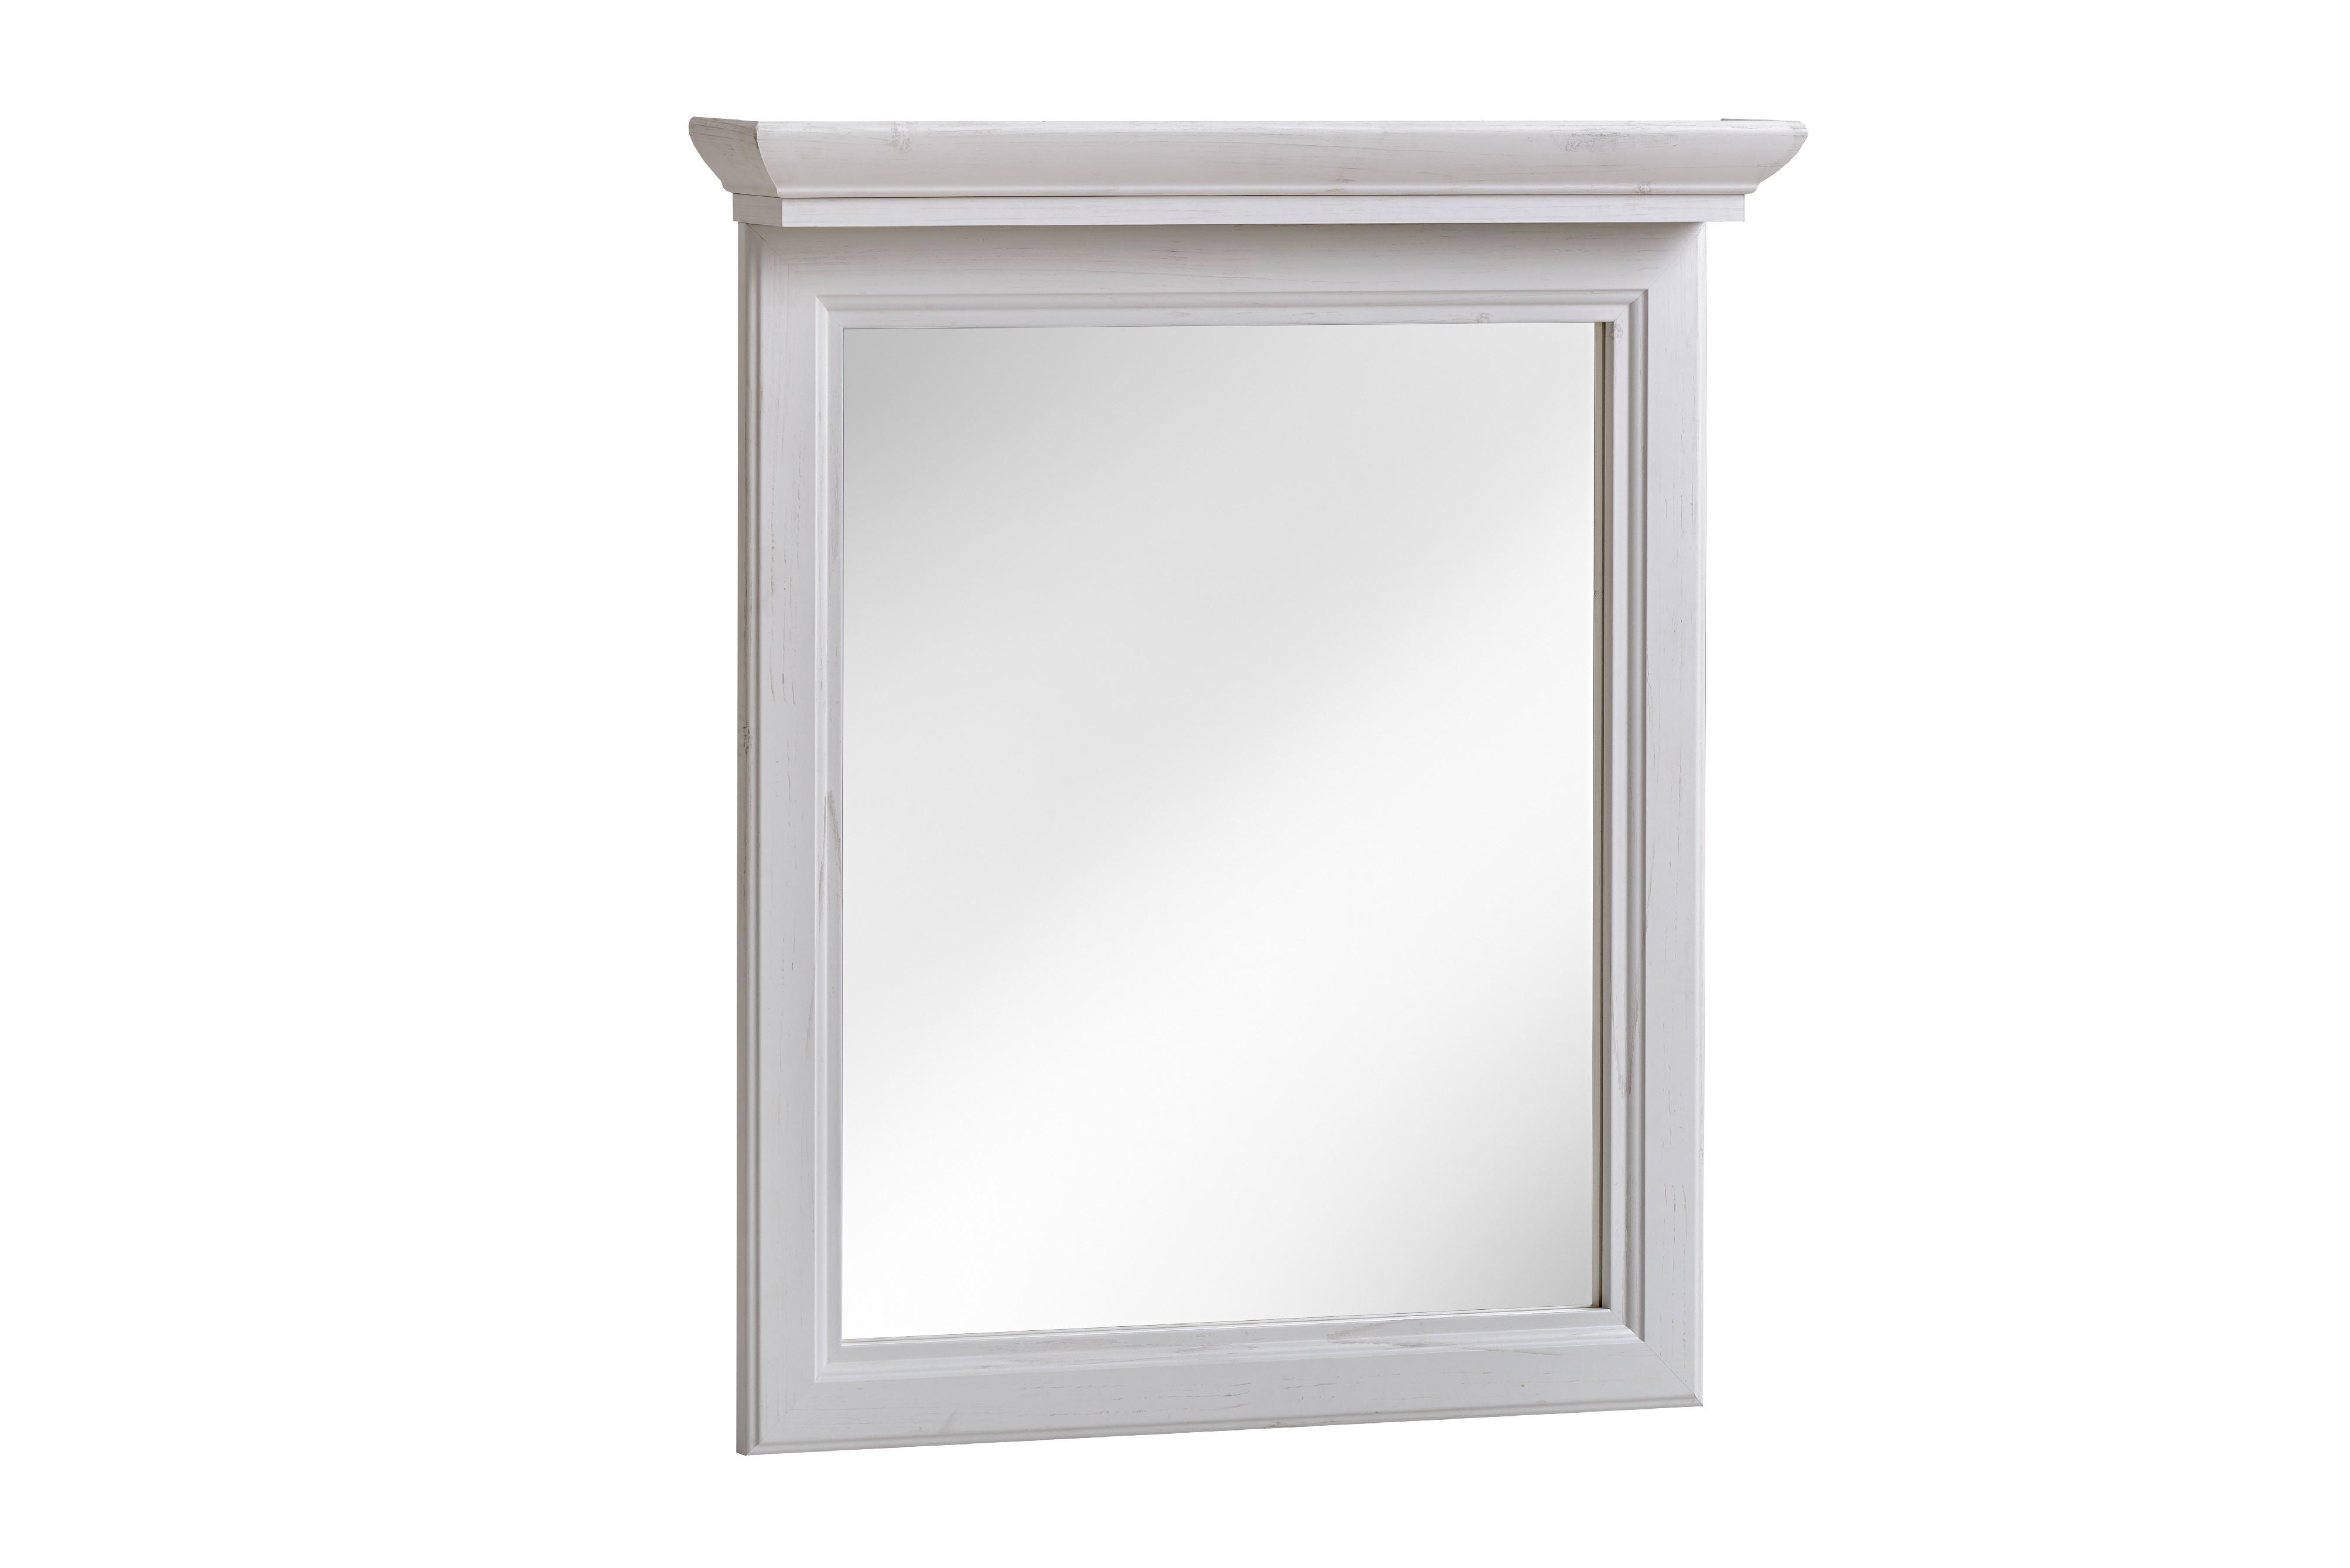 ArtCom Kúpeľňová zostava PALACE ANDERSEN Palace: Zrkadlo 60 - 840 - 76 x 60 x 11 cm